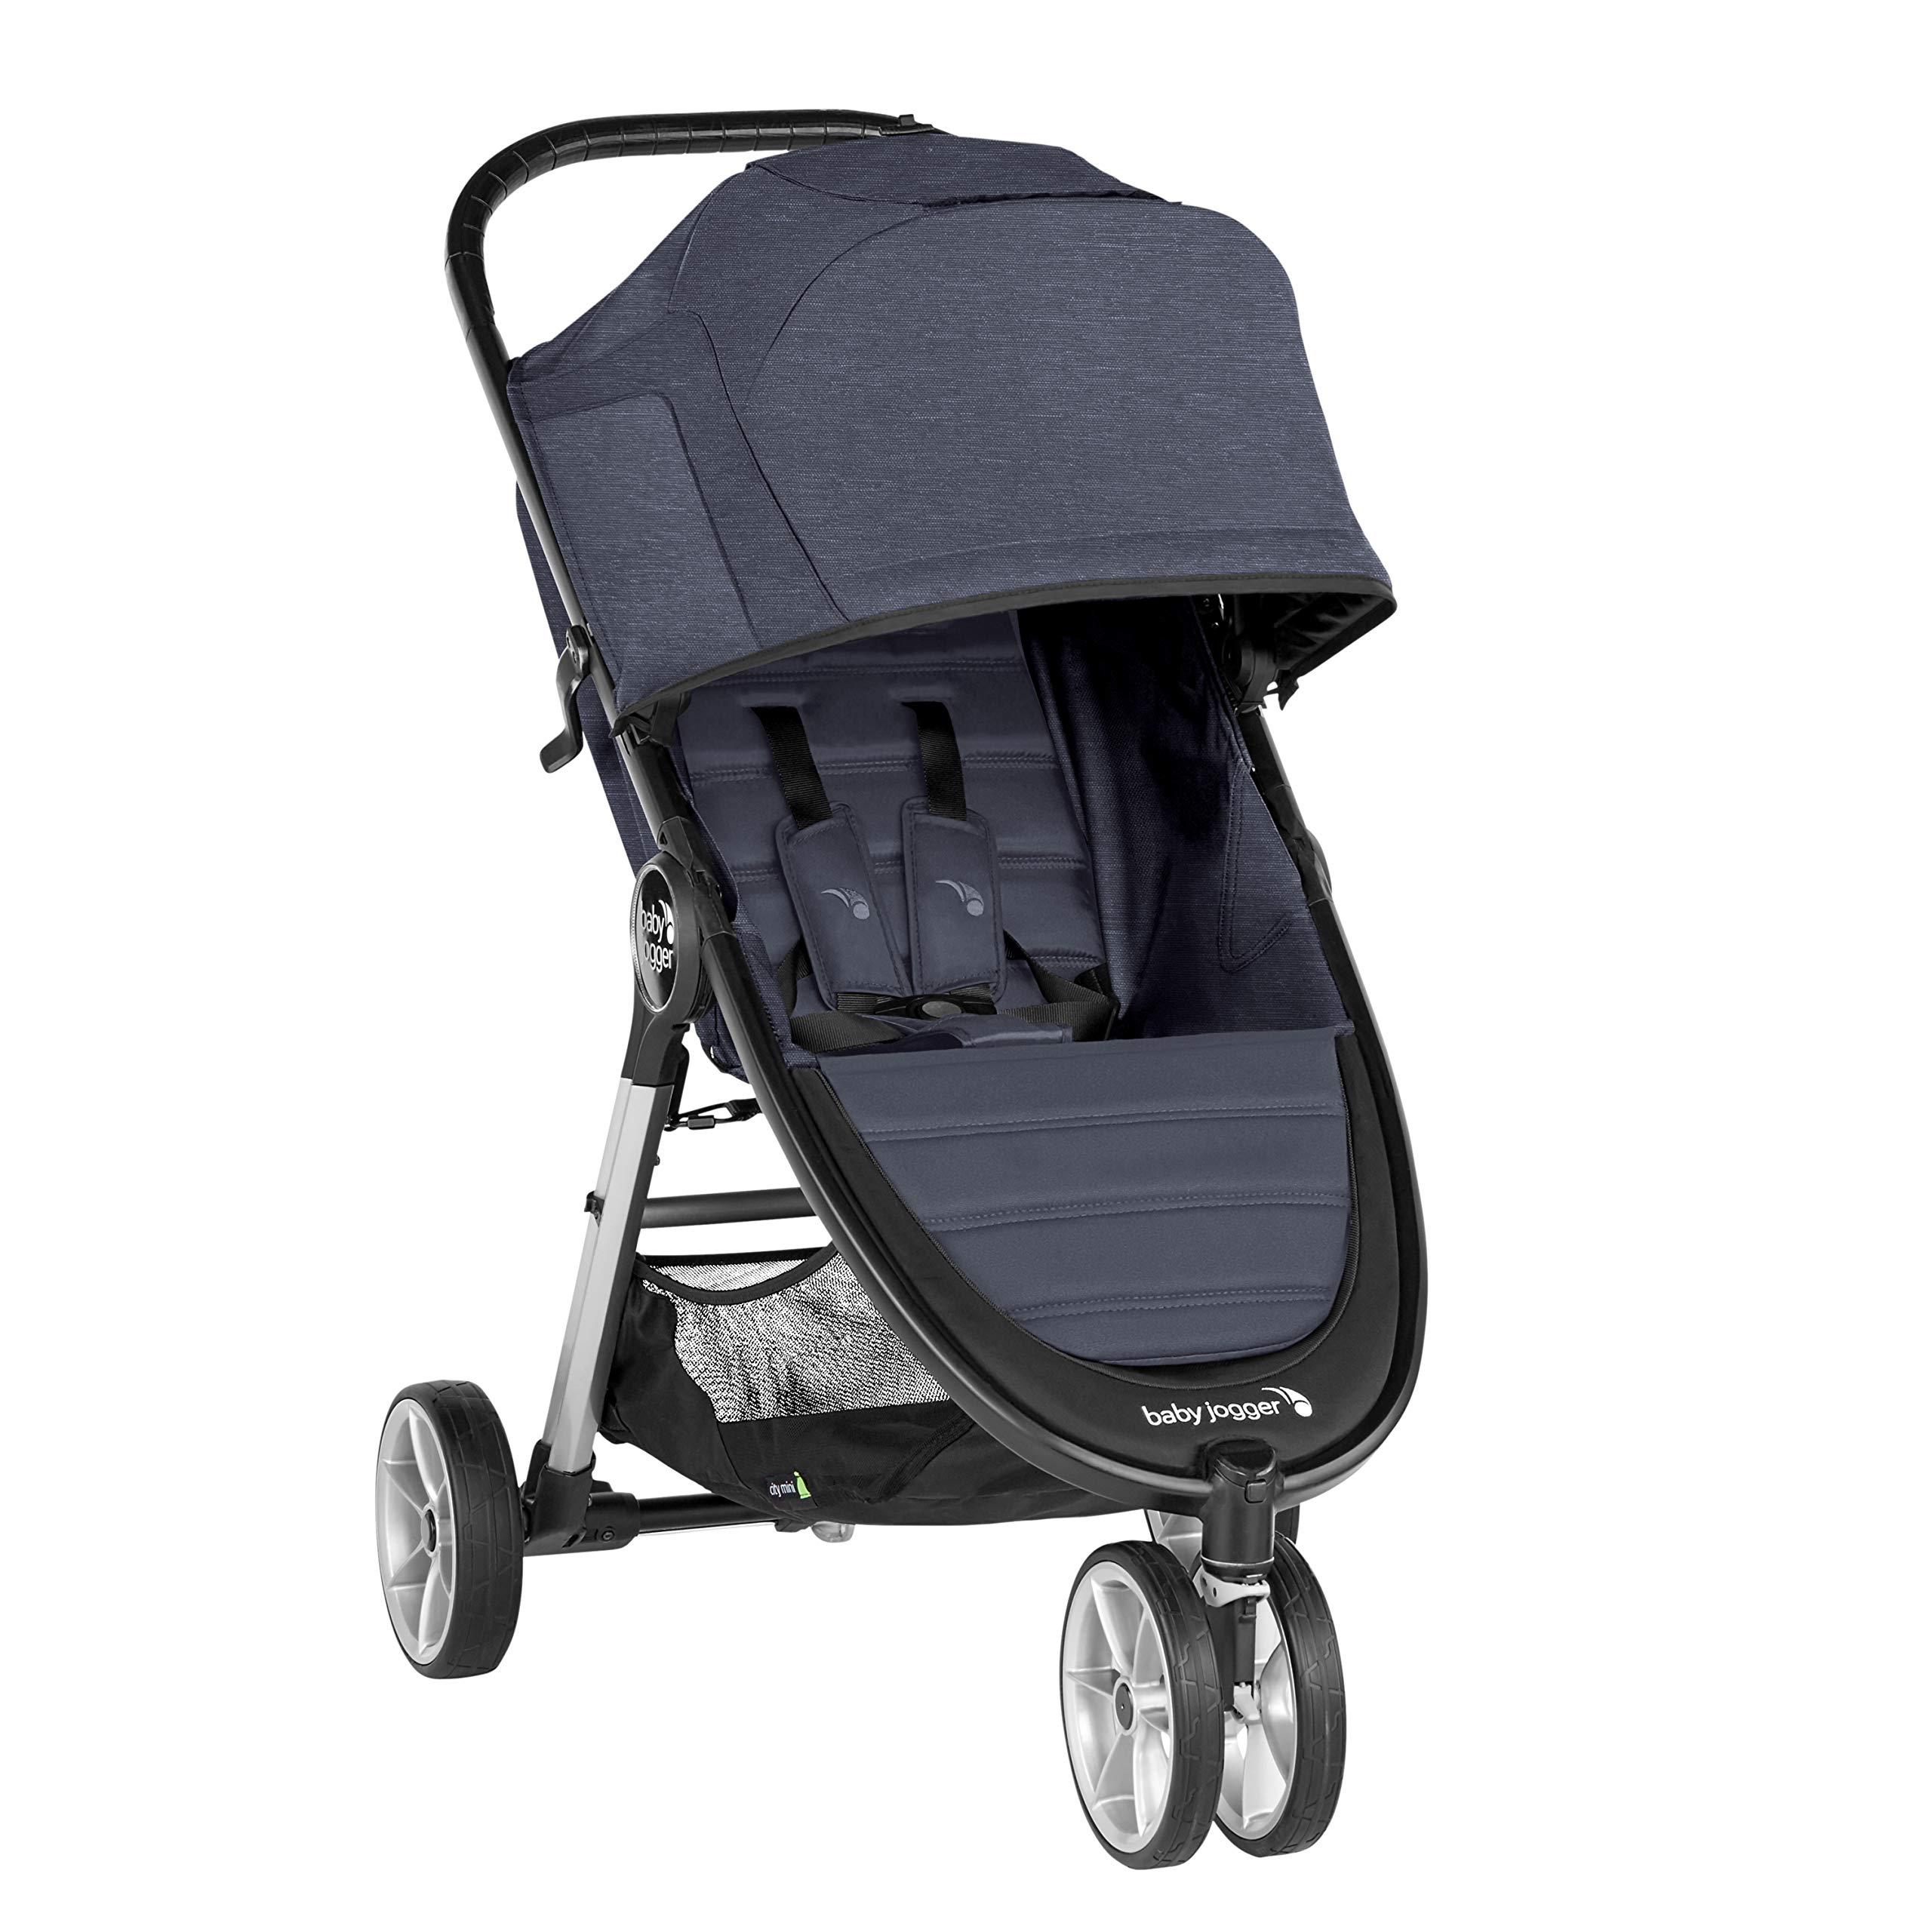 Baby Jogger City Mini 2 Stroller - 2019 | Compact, Lightweight Stroller | Quick Fold Baby Stroller, Carbon